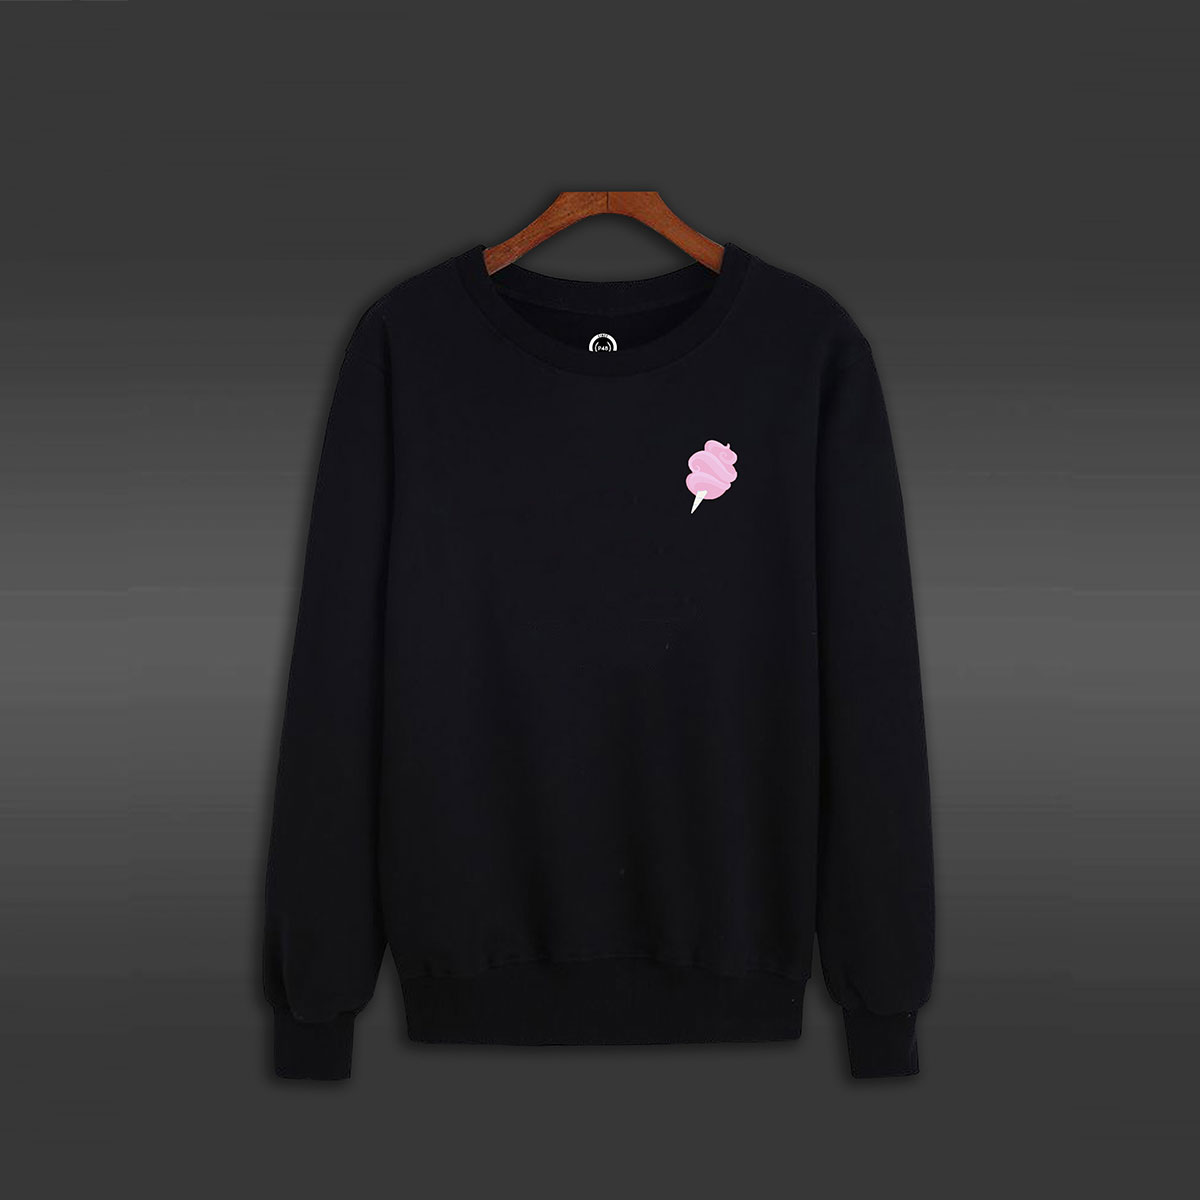 Sugar Crew Neck Sweater - Black